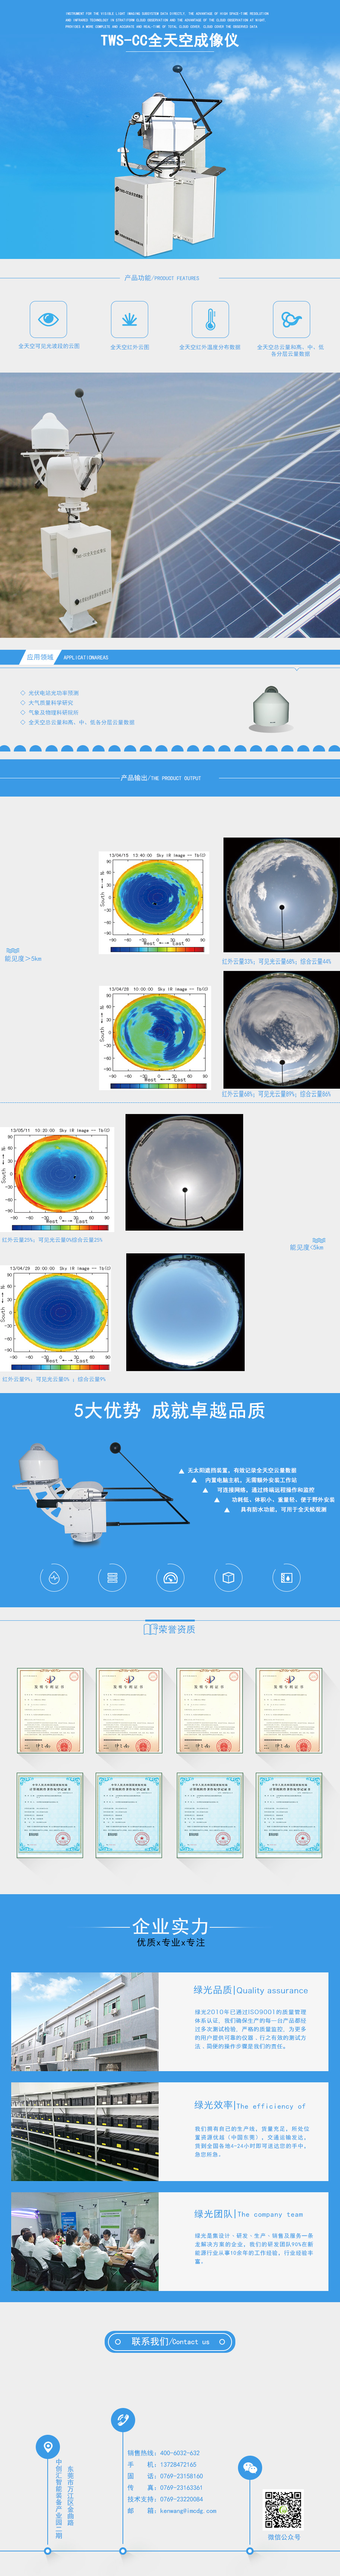 TWS-CC全天空成像仪.jpg